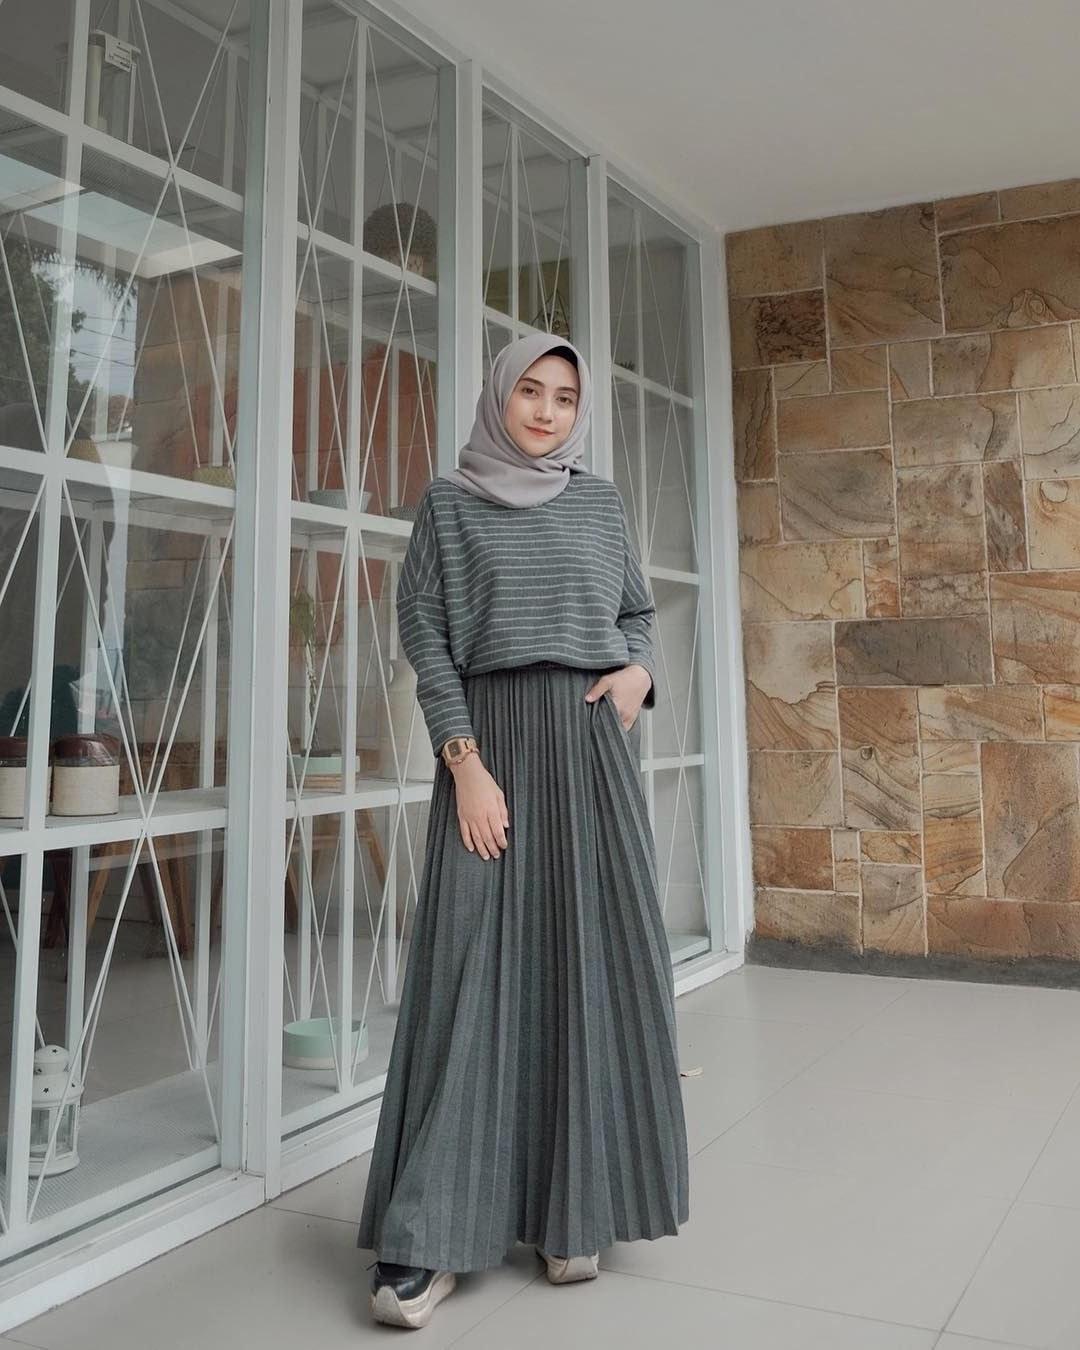 Ide Lihat Model Baju Lebaran Nkde Baju Muslim Lebaran Terbaru 2019 Dengan Gambar